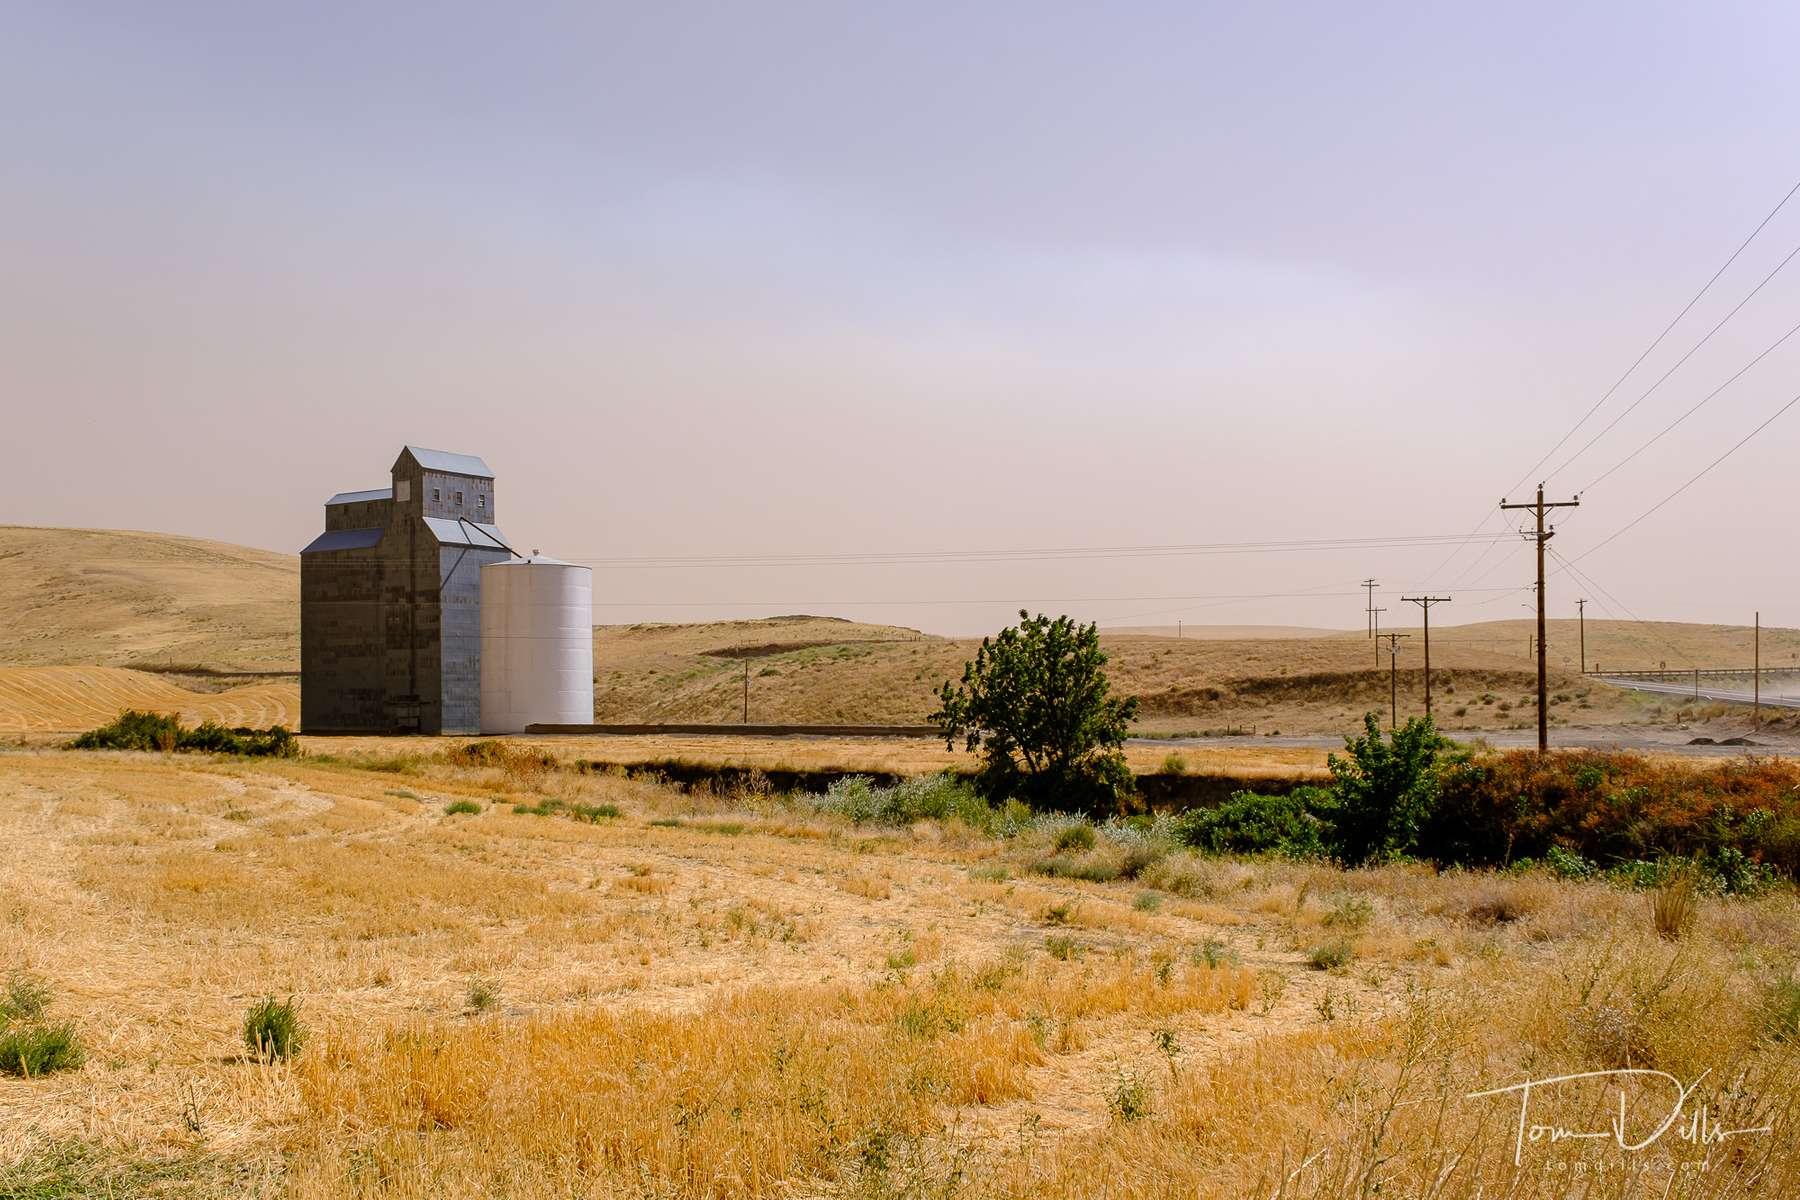 Grain elevator near Starbuck, Washington